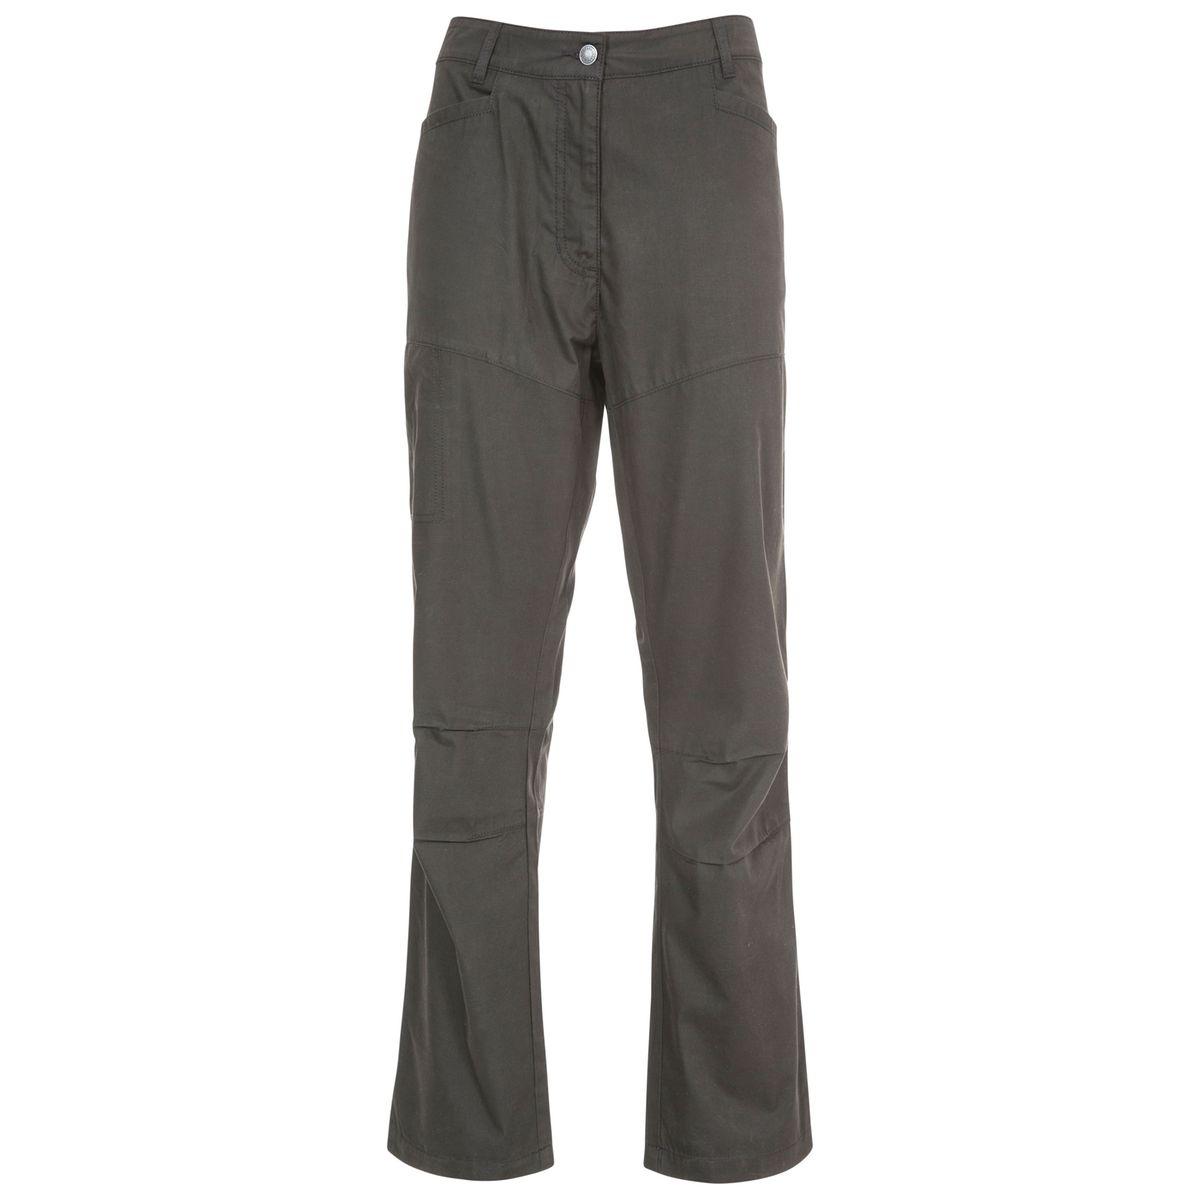 TERRA - pantalon de randonnée - femme